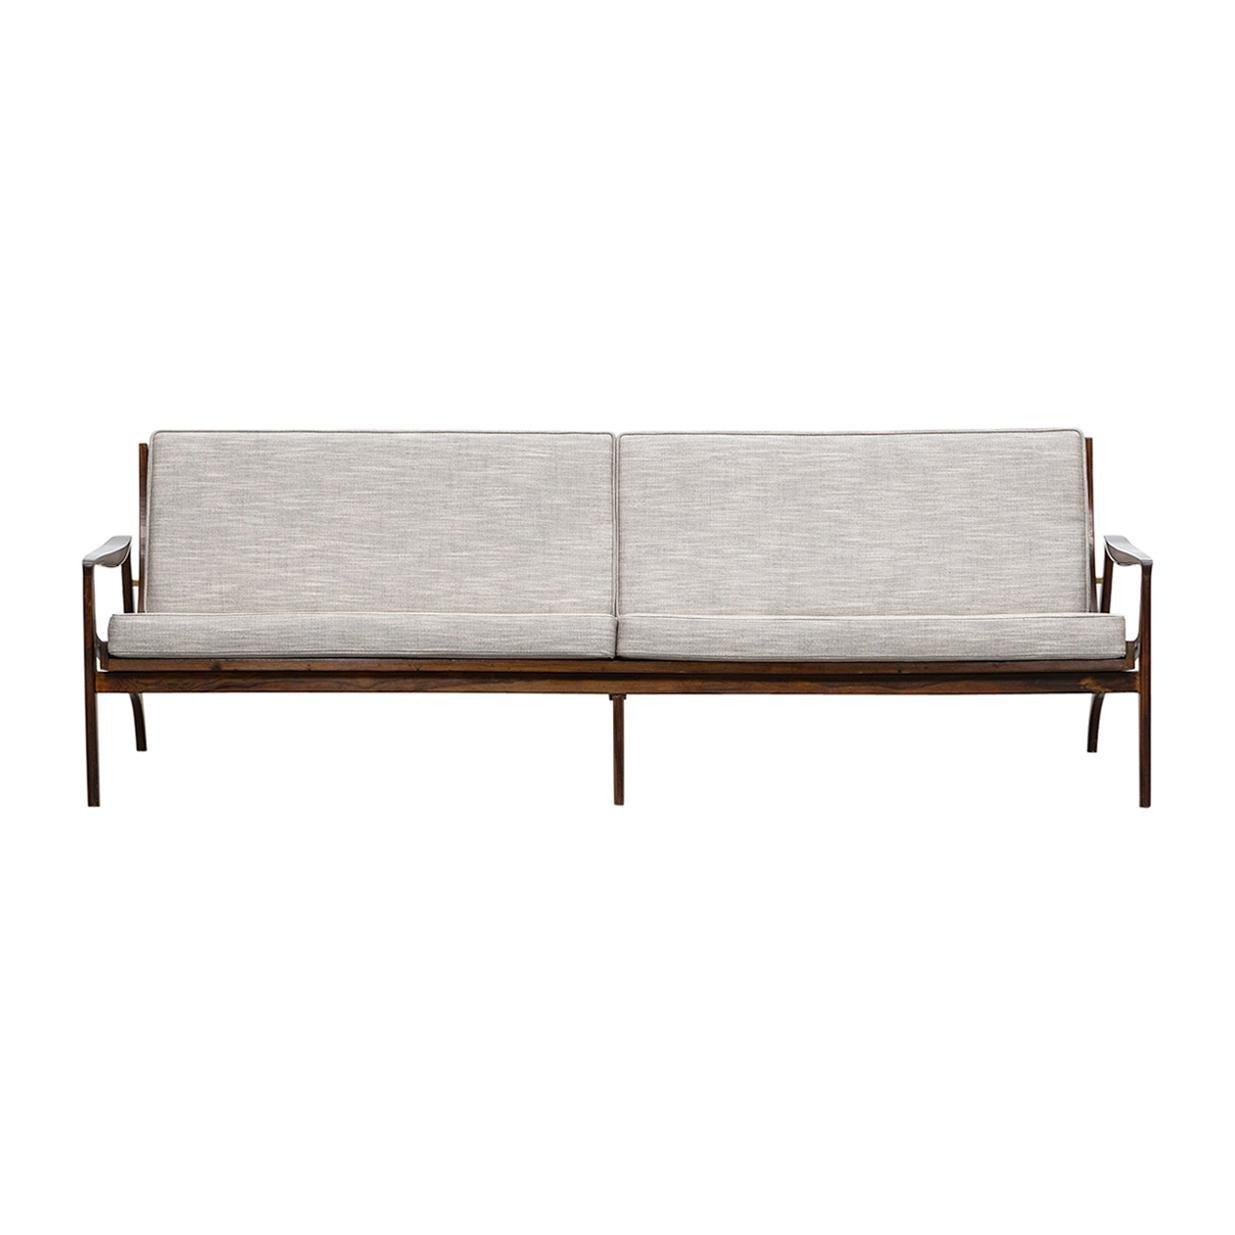 1960s Brazilian Sofa in Jacaranda, New Upholstery